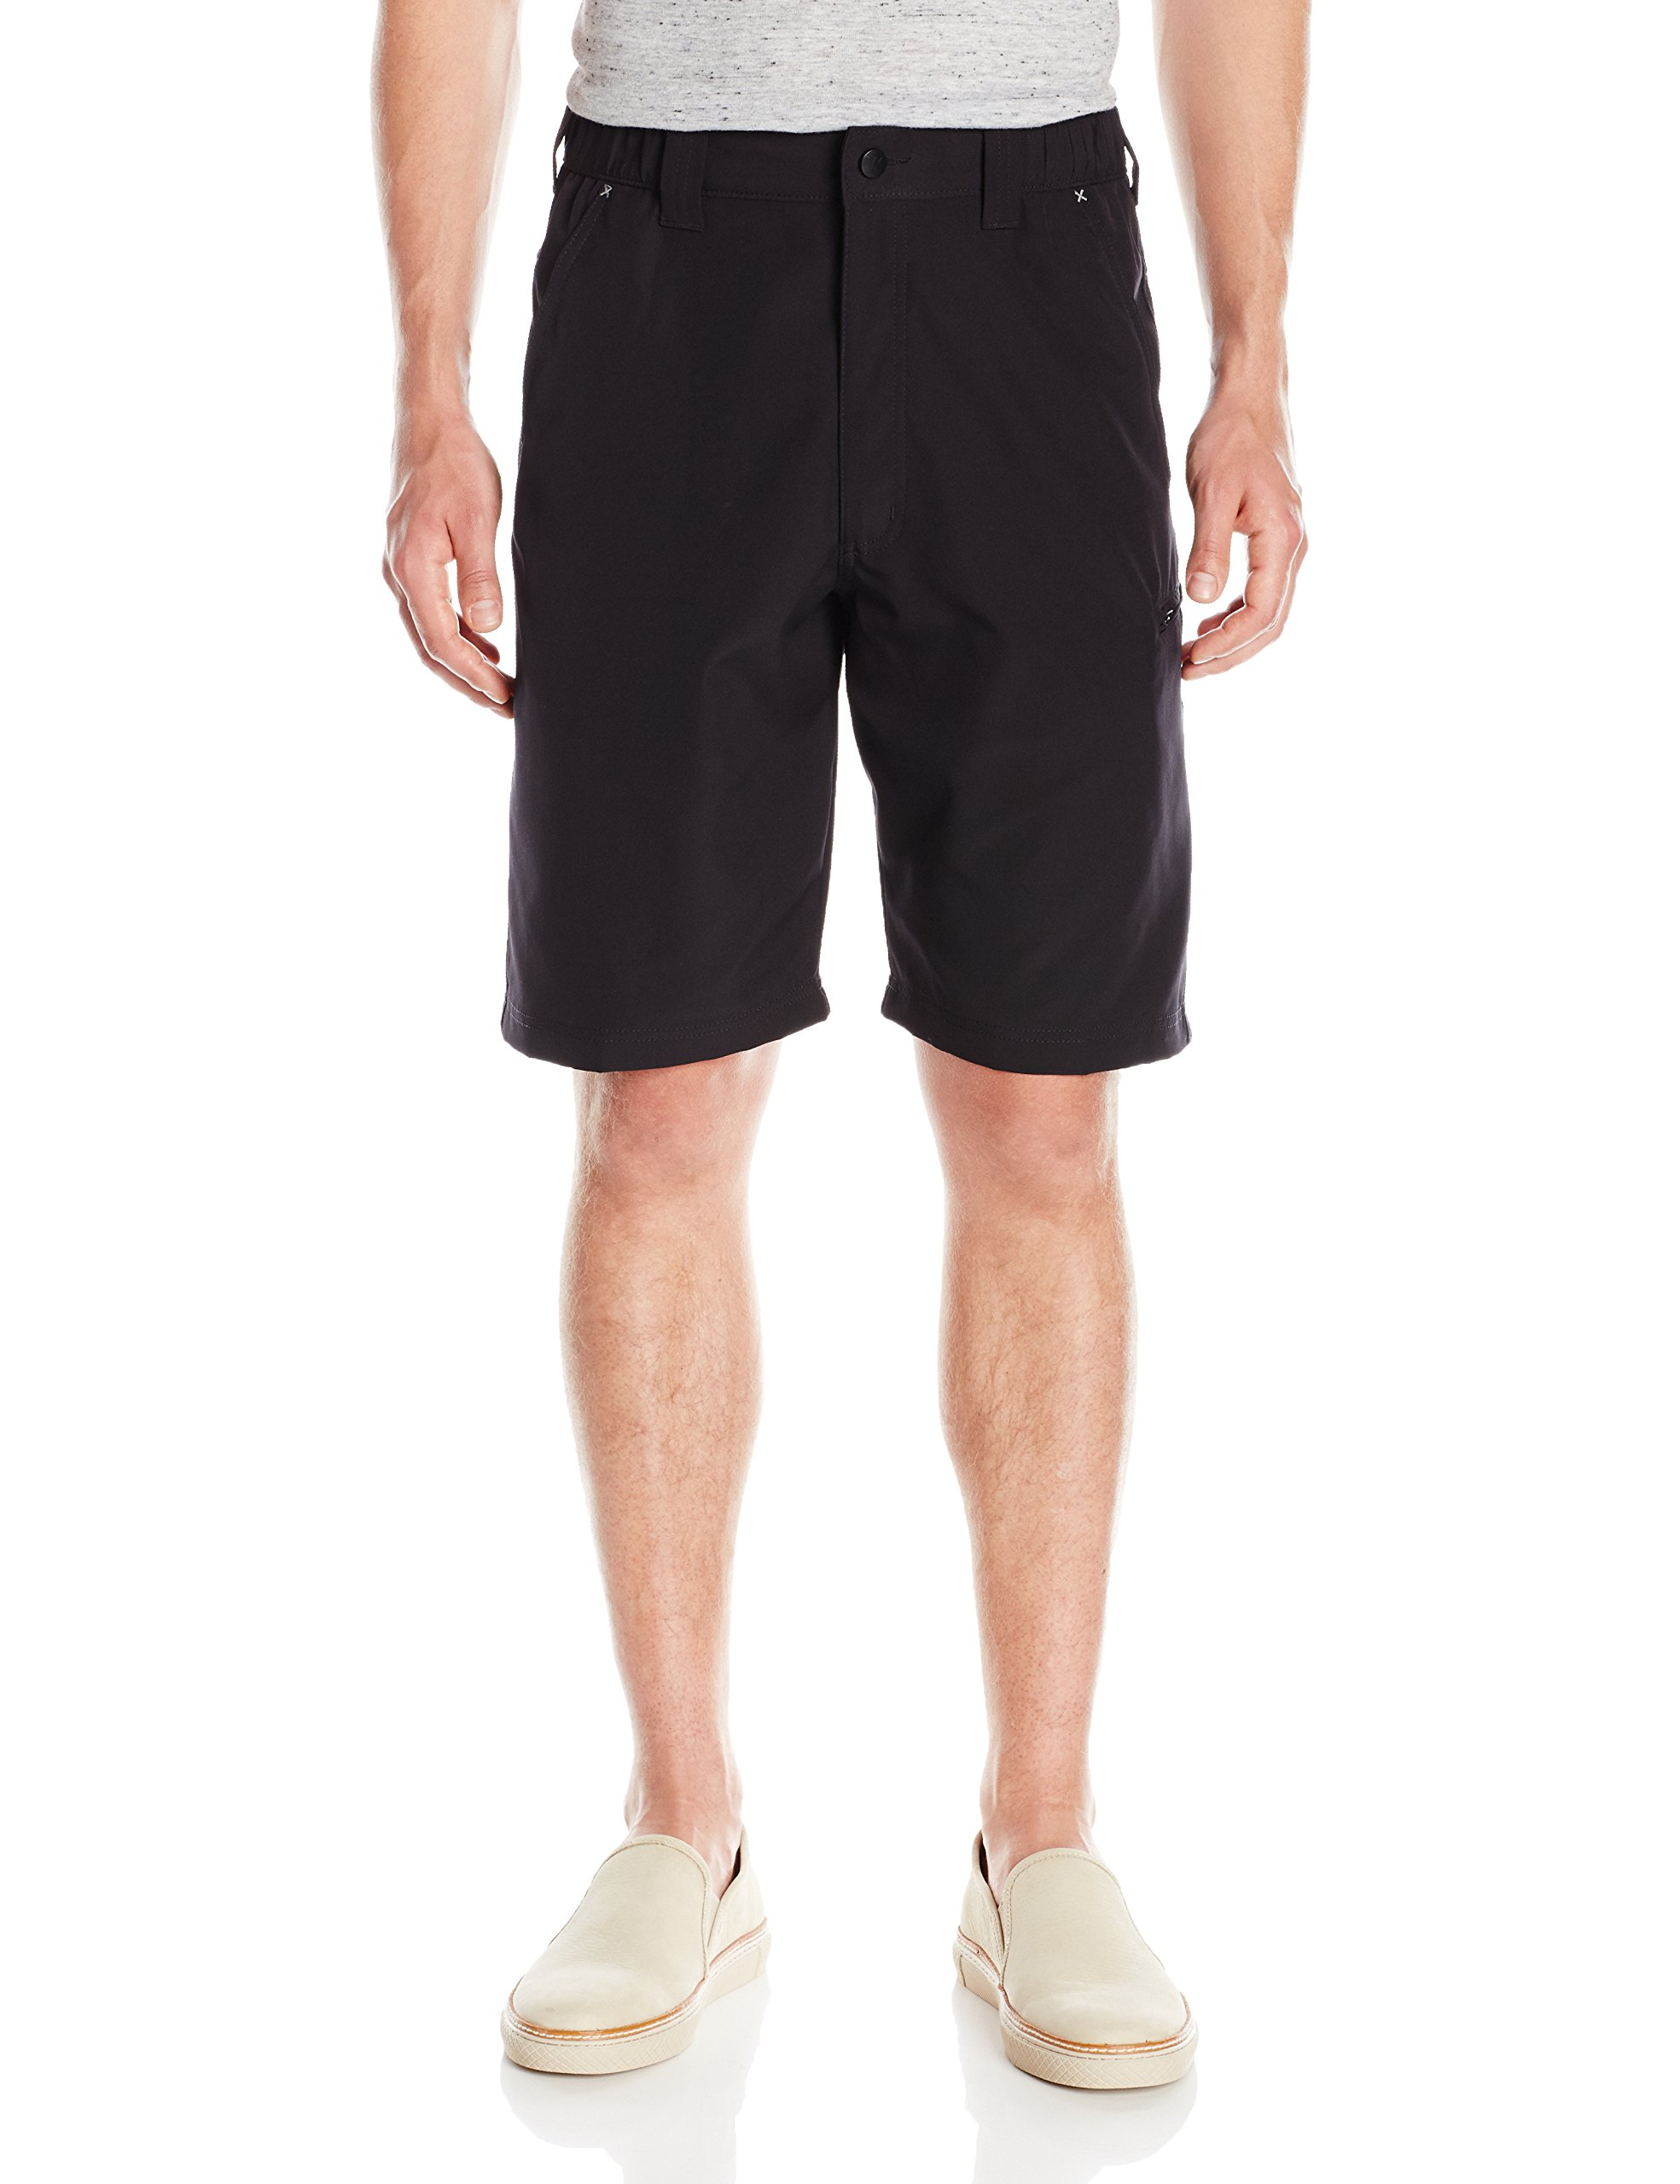 e61ae8a2c8 ... Clothing / Shorts / Cargo. Wrangler Authentics Men's Side Elastic  Utility Short, Black, 32